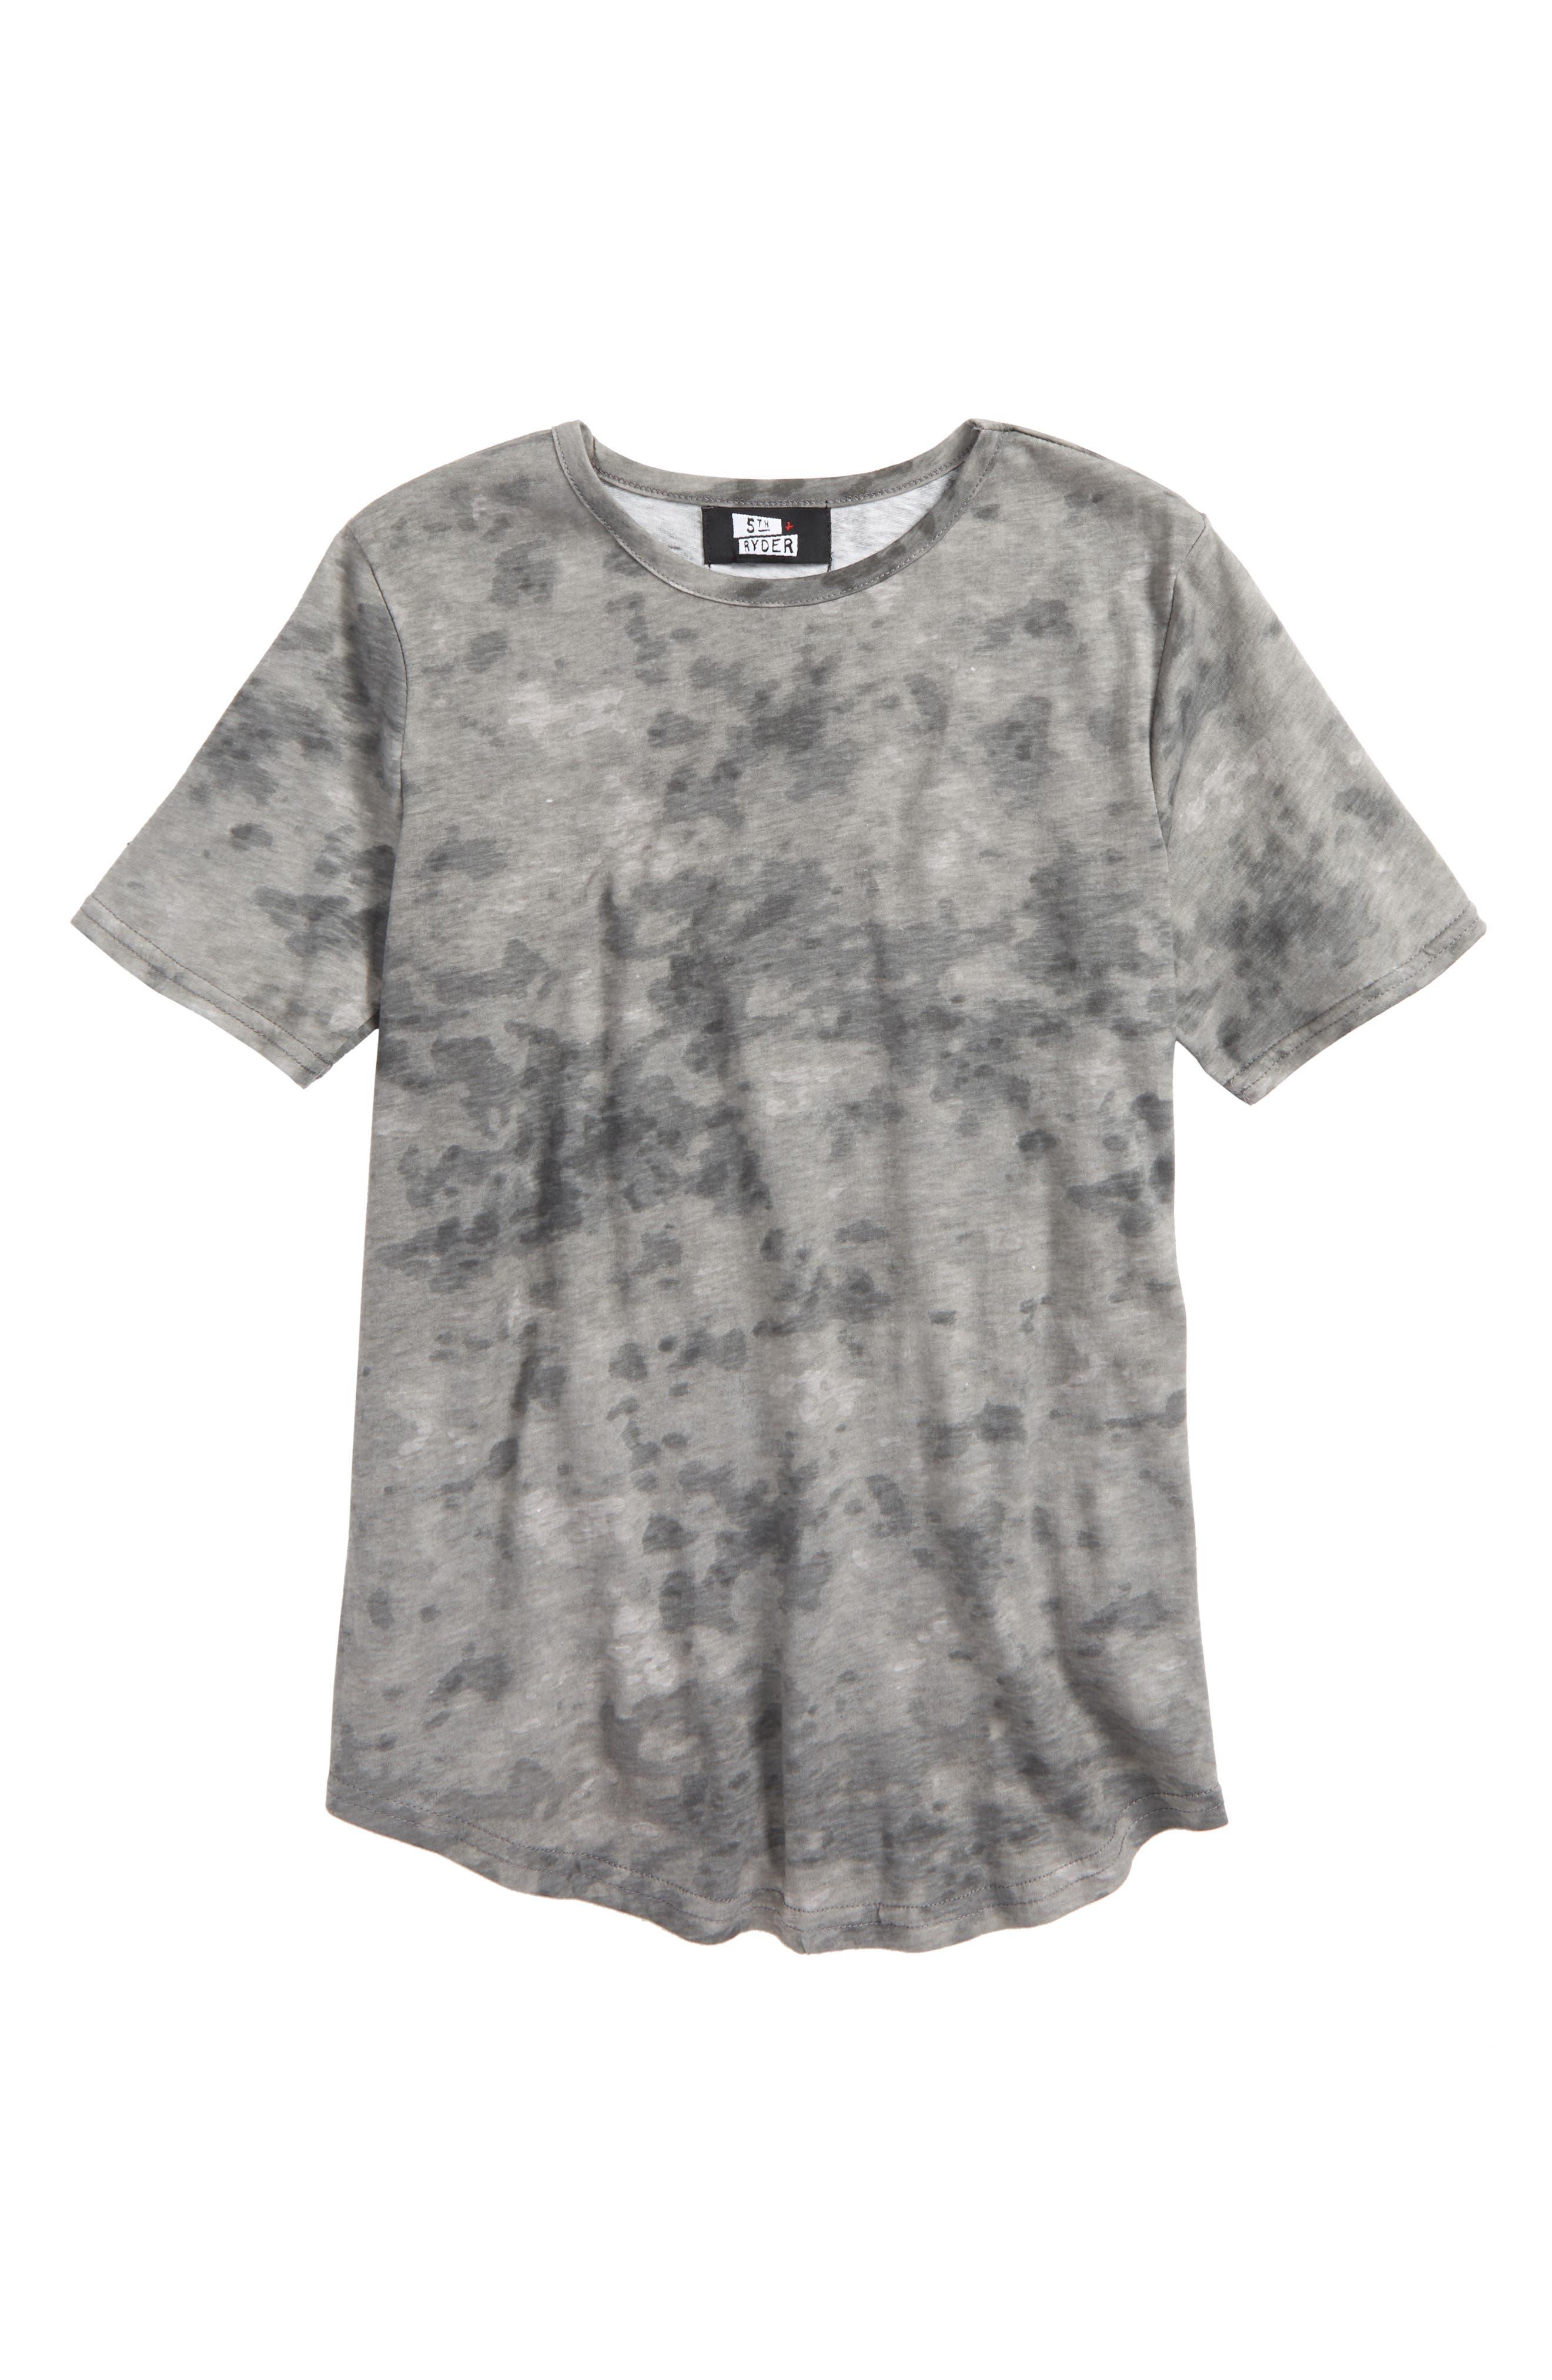 Tie Dye T-Shirt,                             Main thumbnail 1, color,                             Grey Snow Wash Print